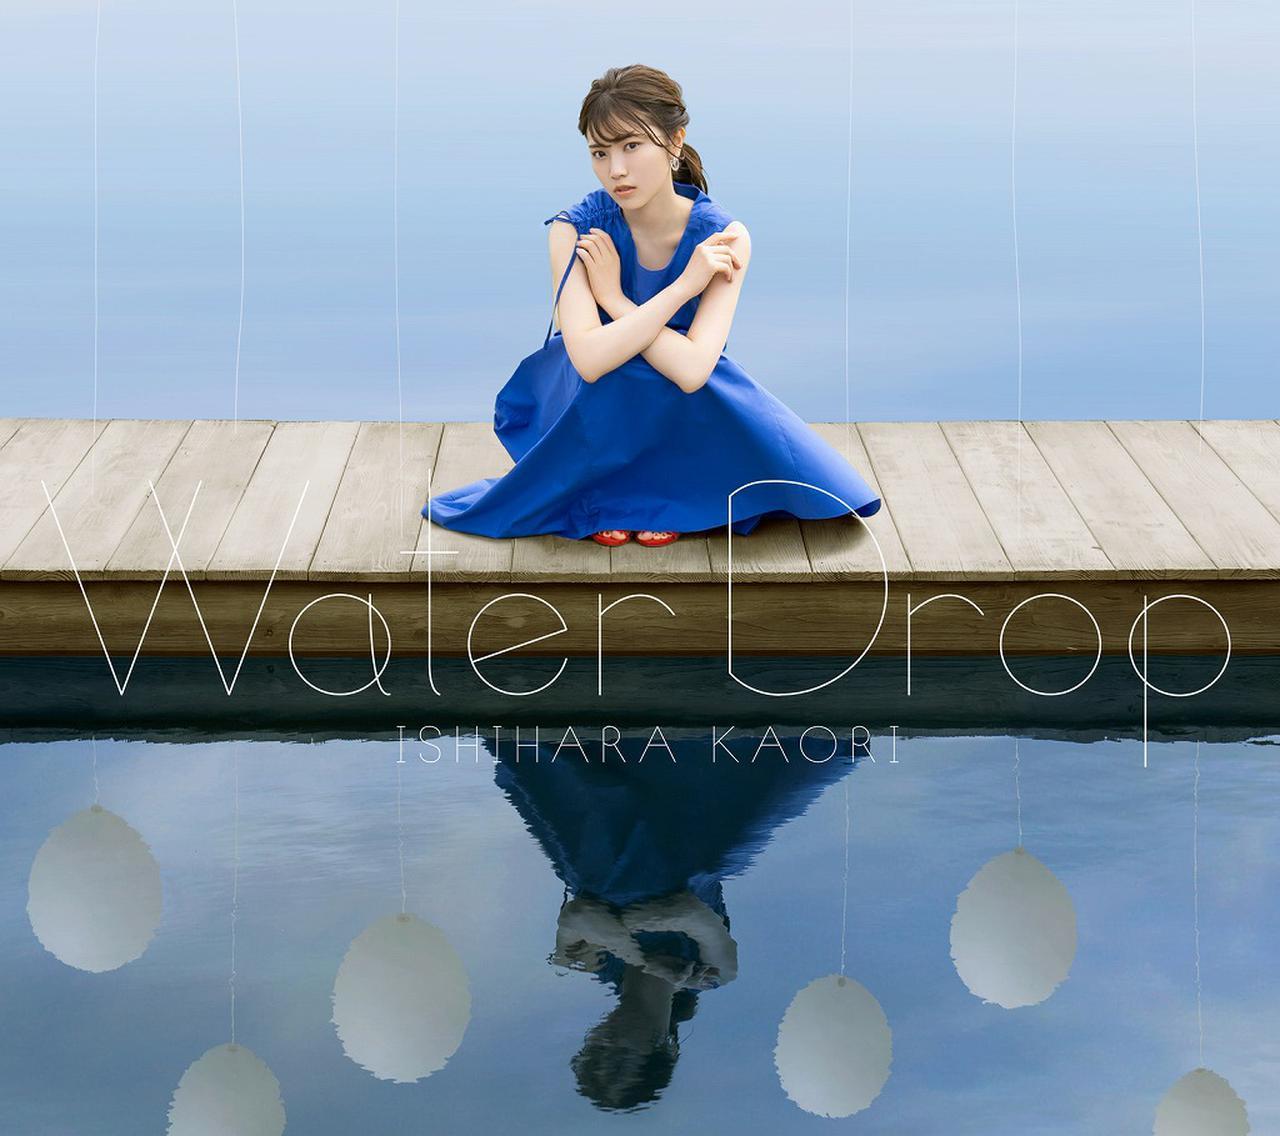 画像: Water Drop / 石原夏織